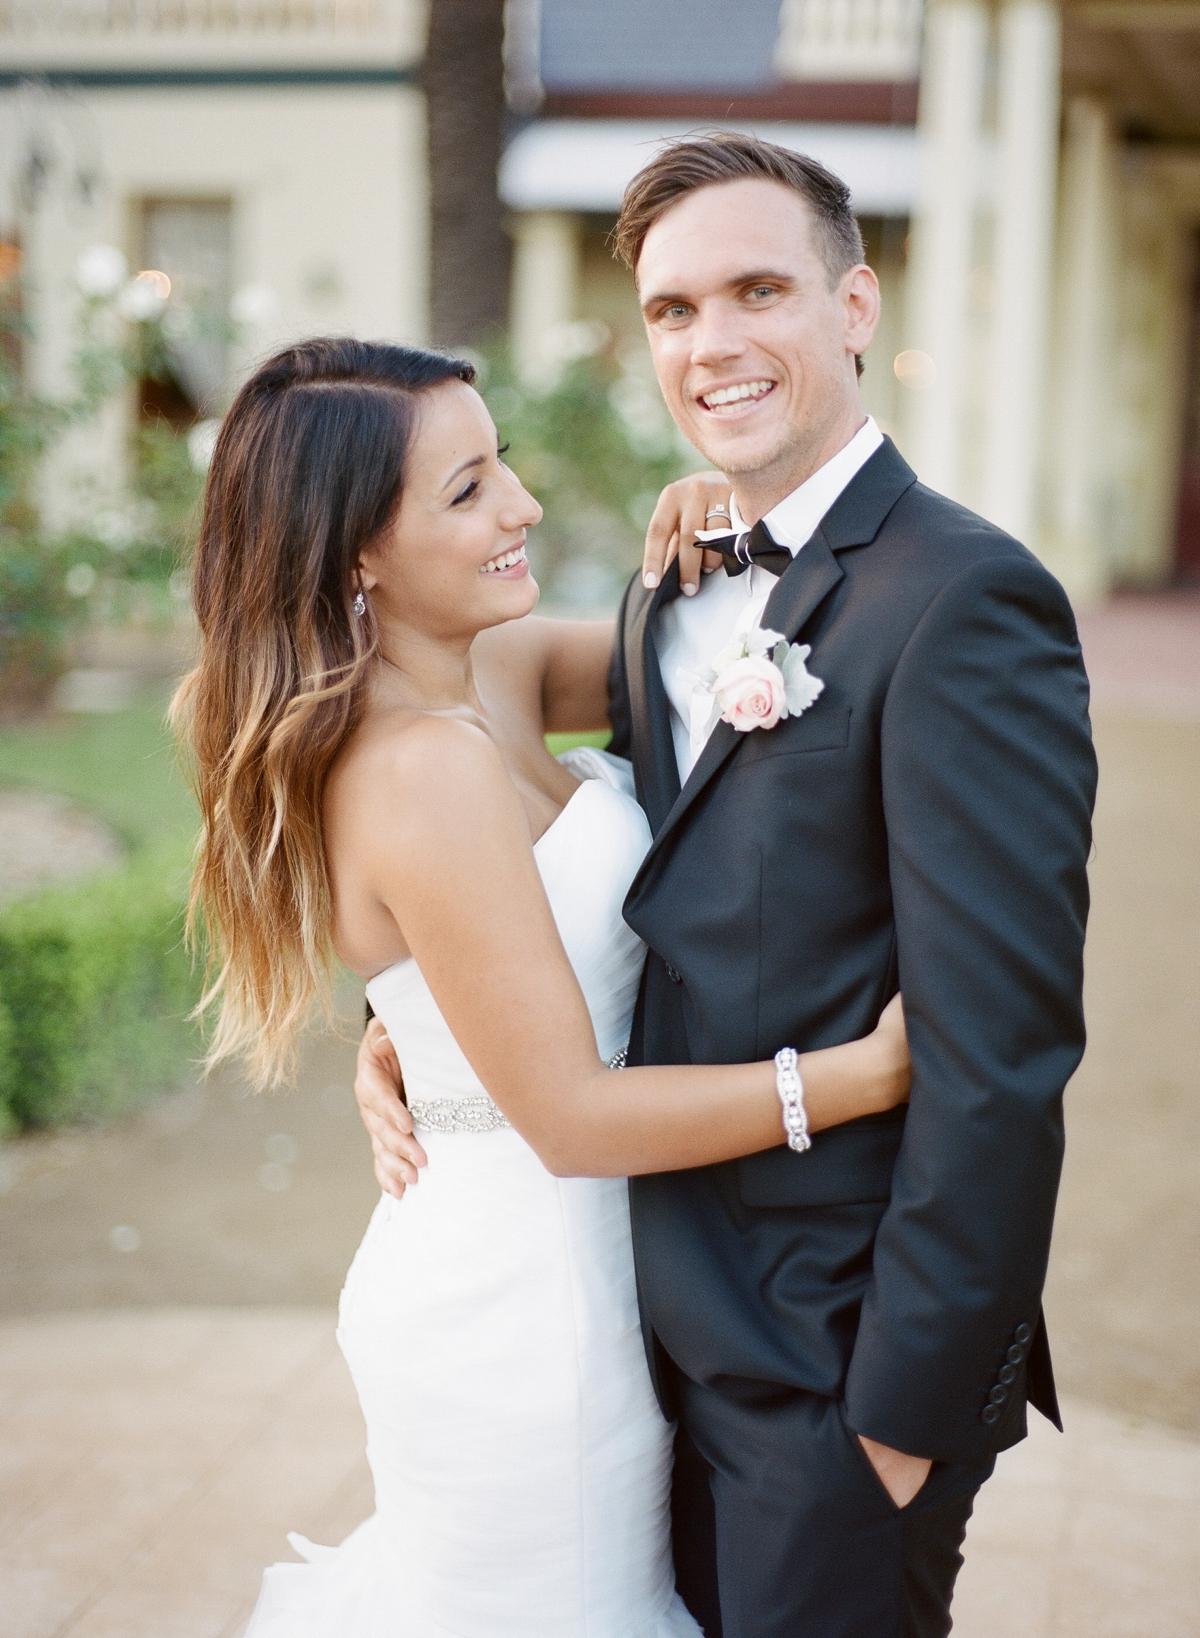 Jaryd and Sarah's Sydney Wedding by Mr Edwards Photography_2352.jpg